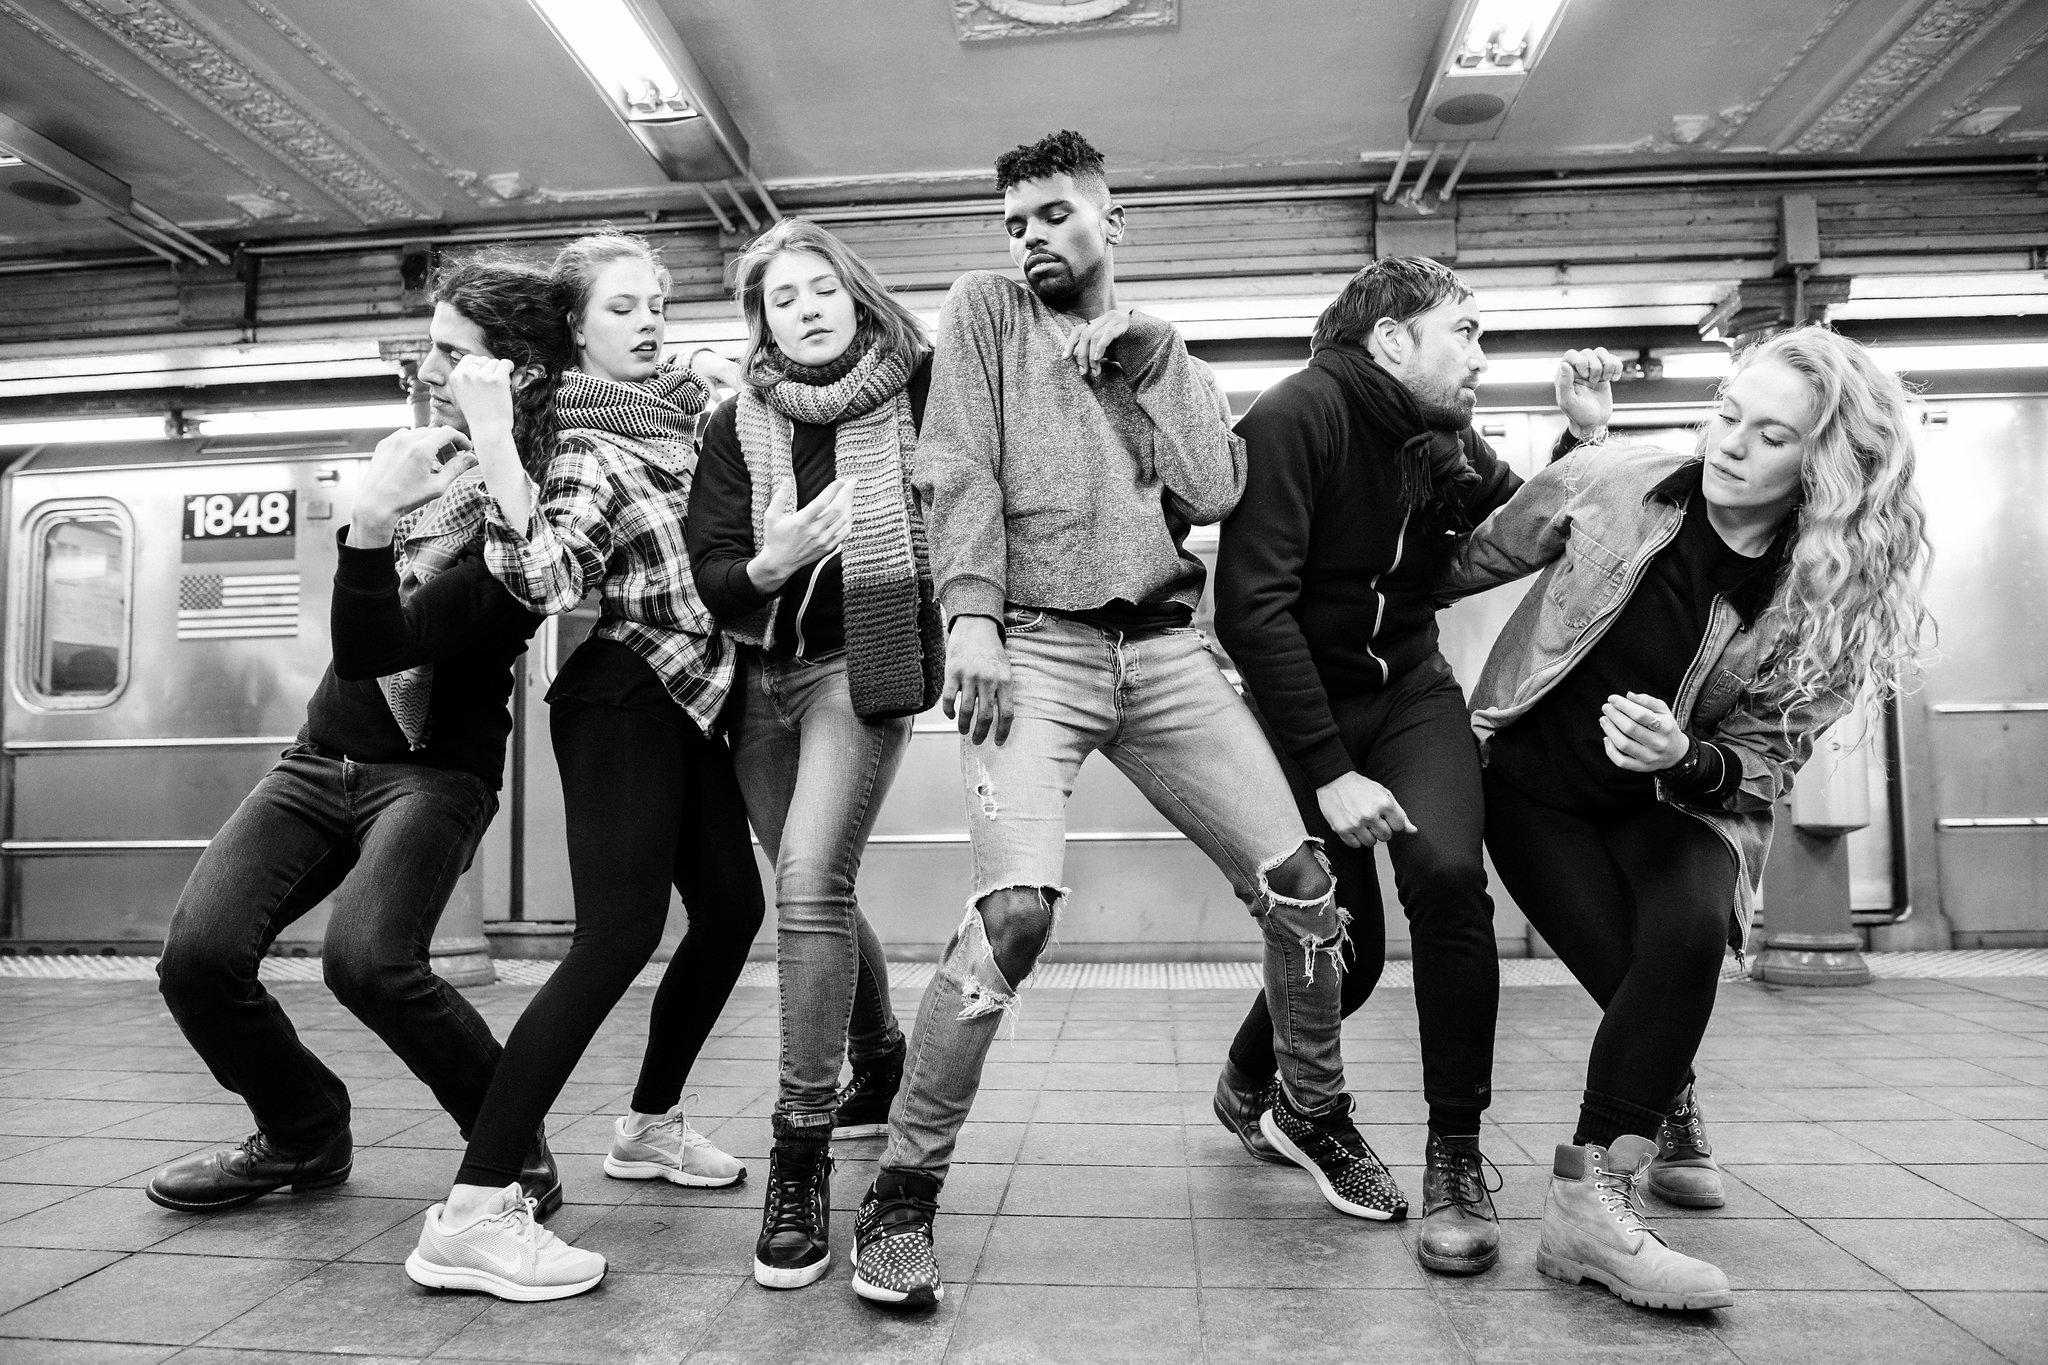 2018_01_14_shals_dance_nyc-6580-Copy1.jpg